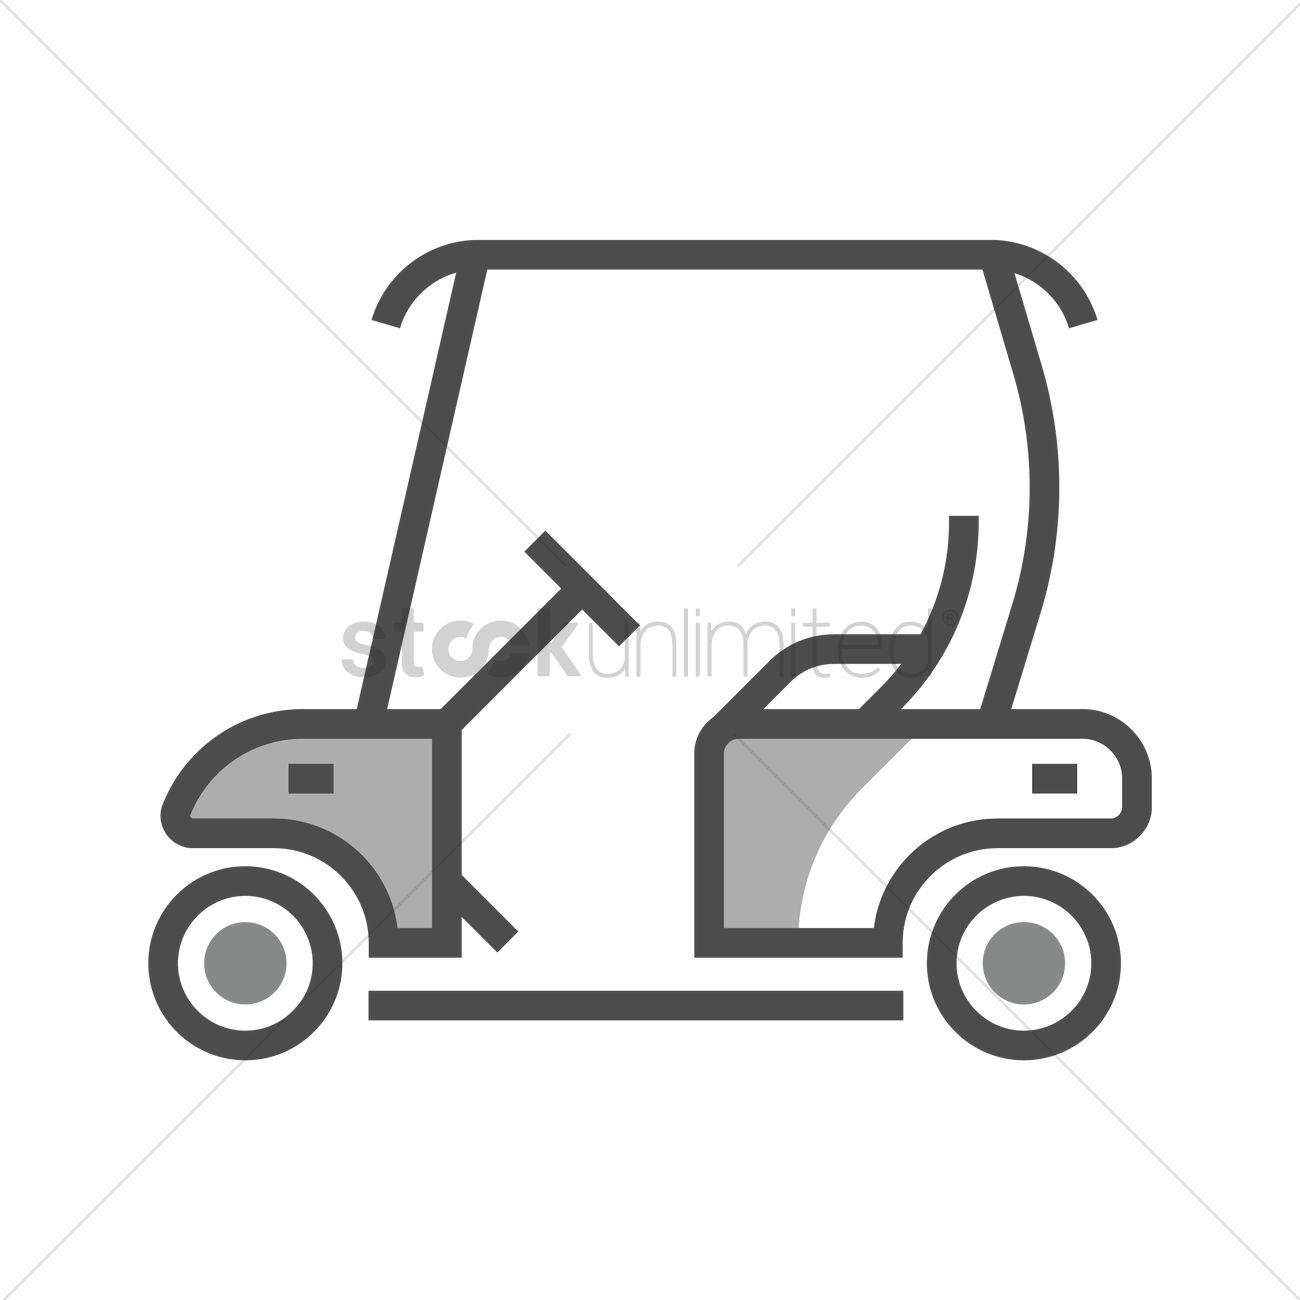 1300x1300 Golf Cart Vector Image